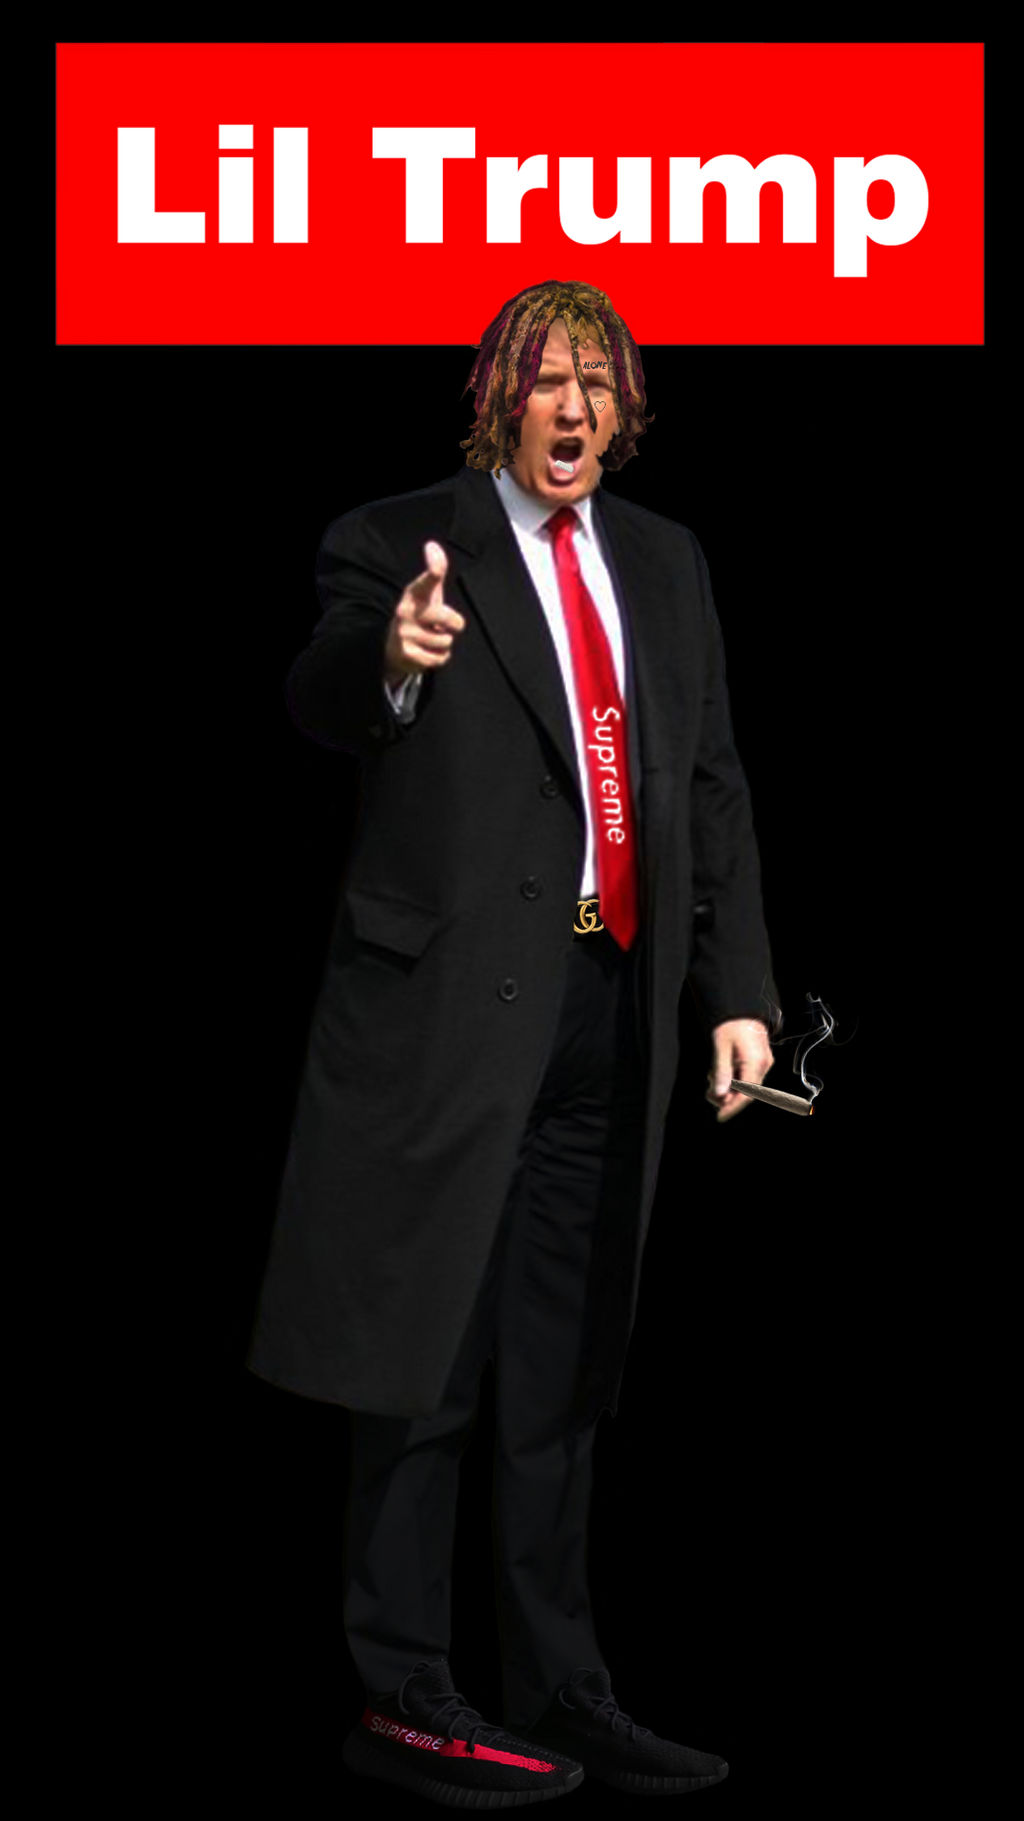 Lil Trump Mobile Wallpaper By Aron260 On Deviantart